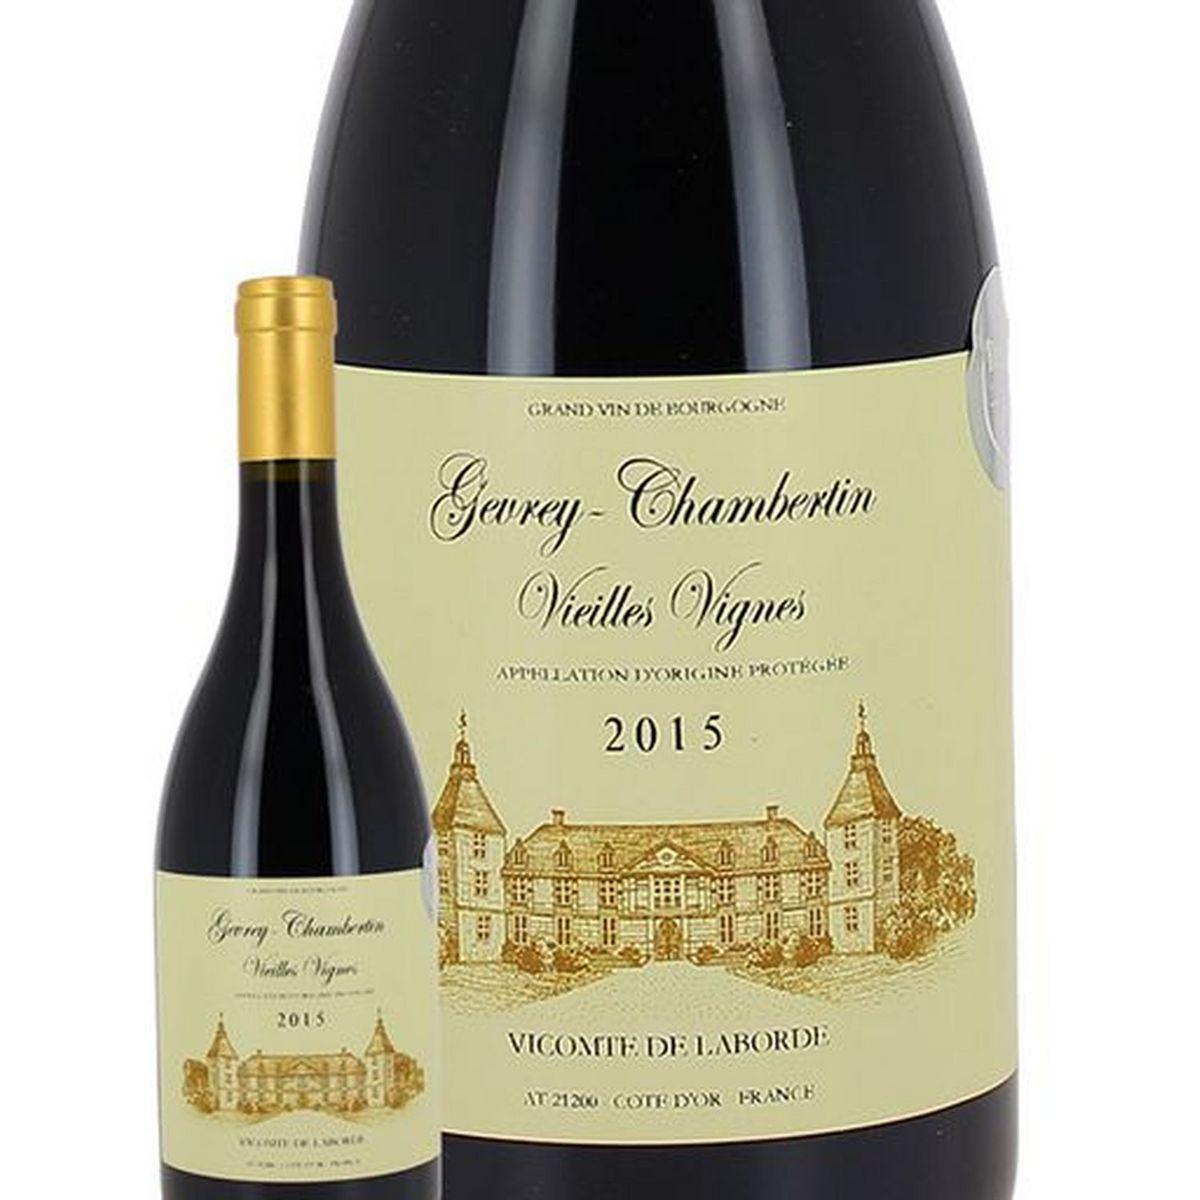 AOP Gevrey-Chambertin Vieilles Vignes Vicomte de Laborde rouge 2015